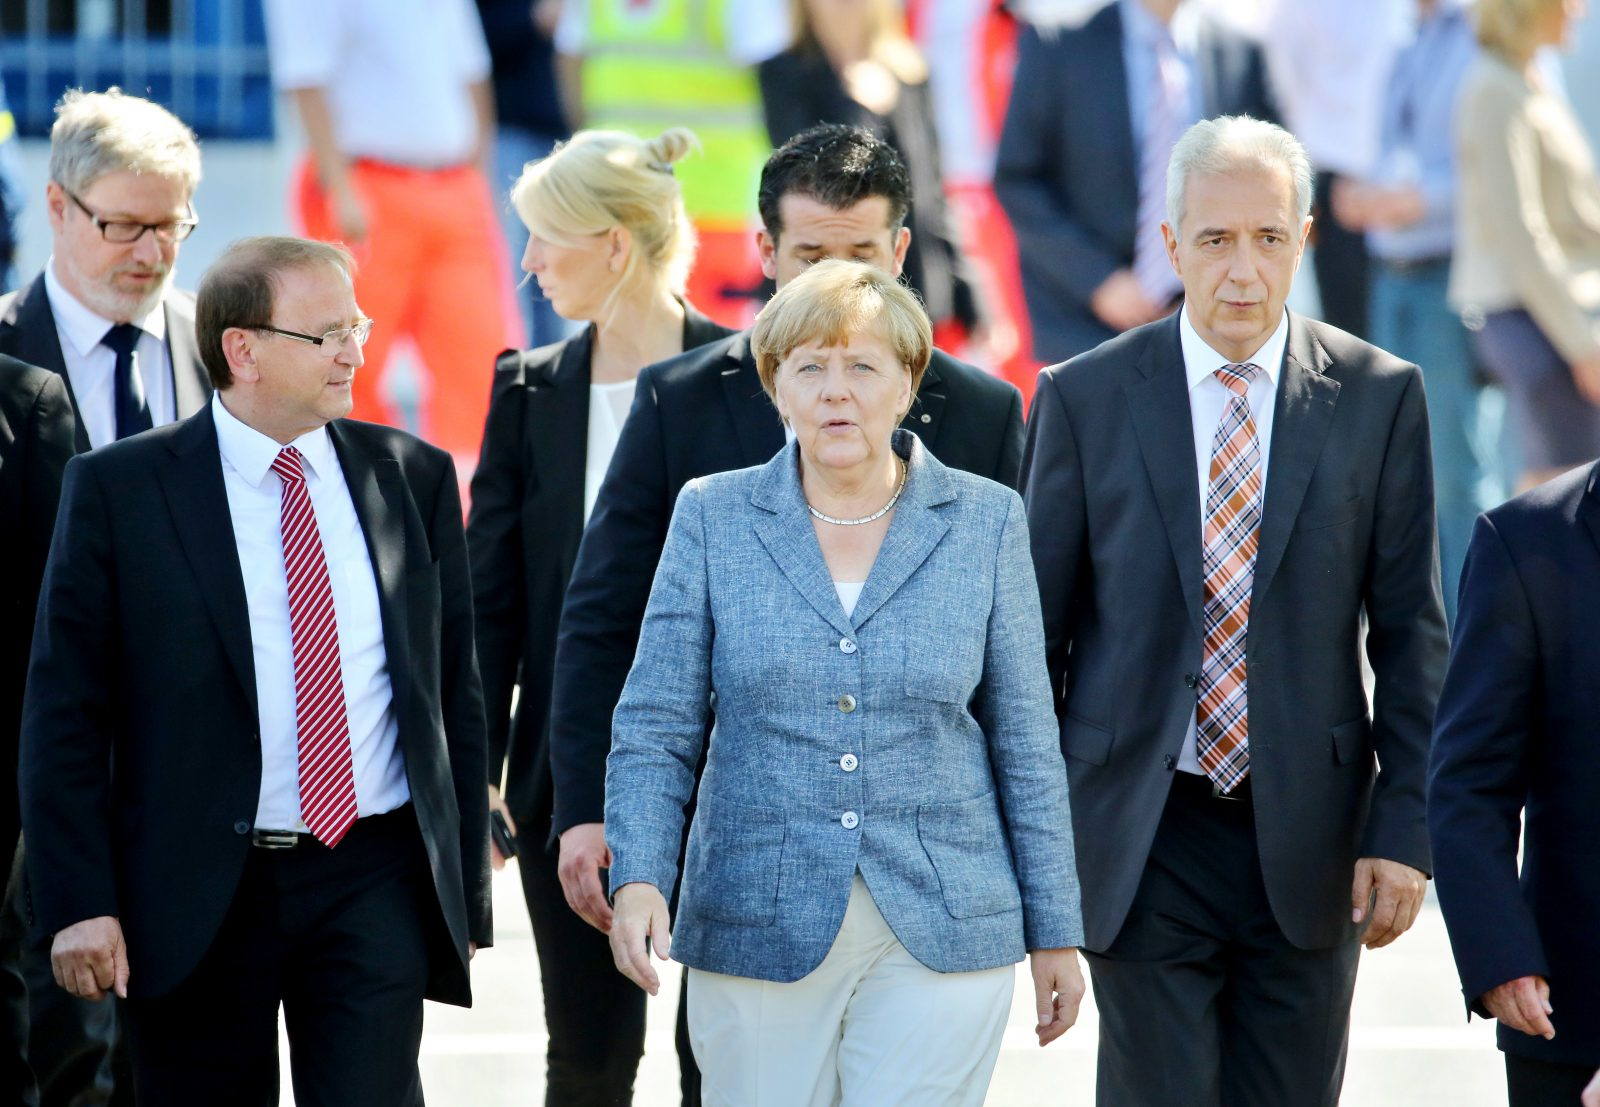 Heidenaus Bürgermeister Jürgen Opitz (CDU) (2. v. l.) führt Bundeskanzlerin Angela Merkel (CDU) 2015 durch die Flüchtlingsunterkunft (Archivbild) Foto: (c) dpa